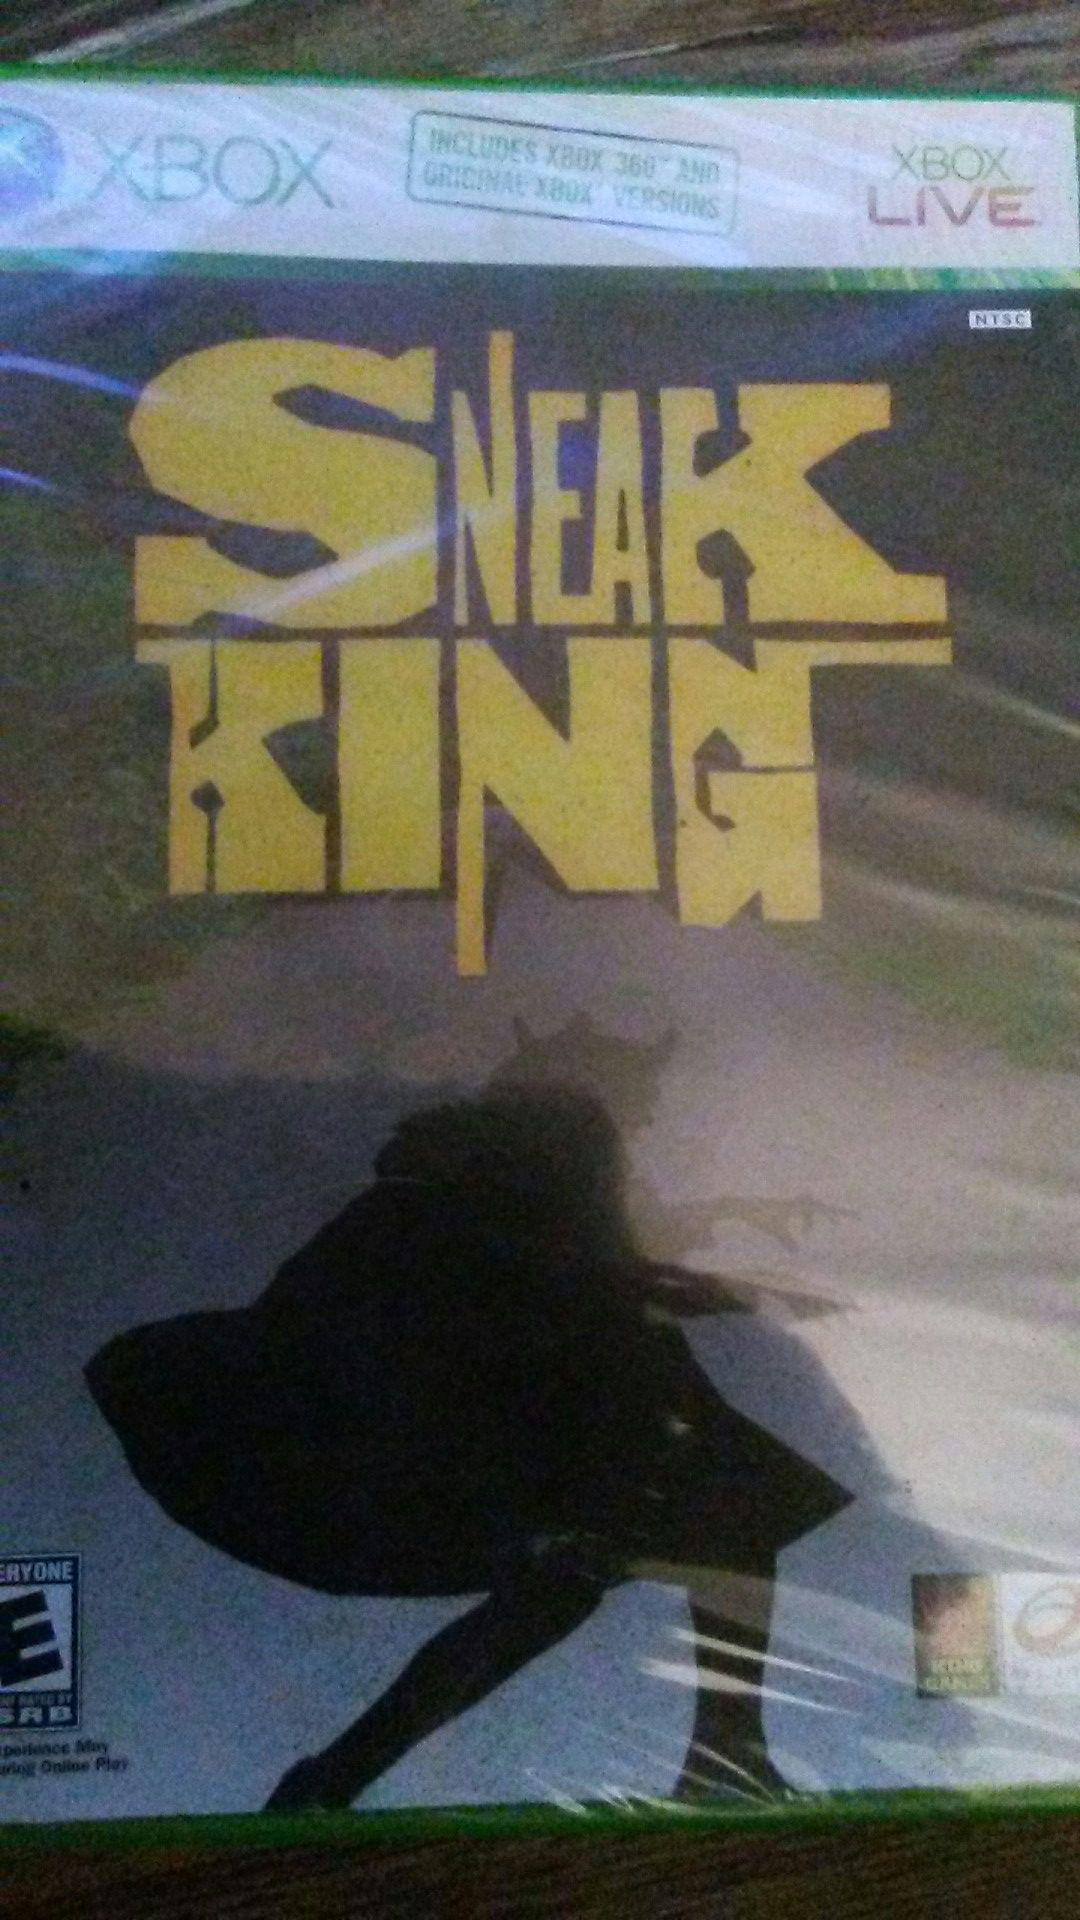 """SNEAK KING"" - For The Original XBox (&/or XBox 360!)"